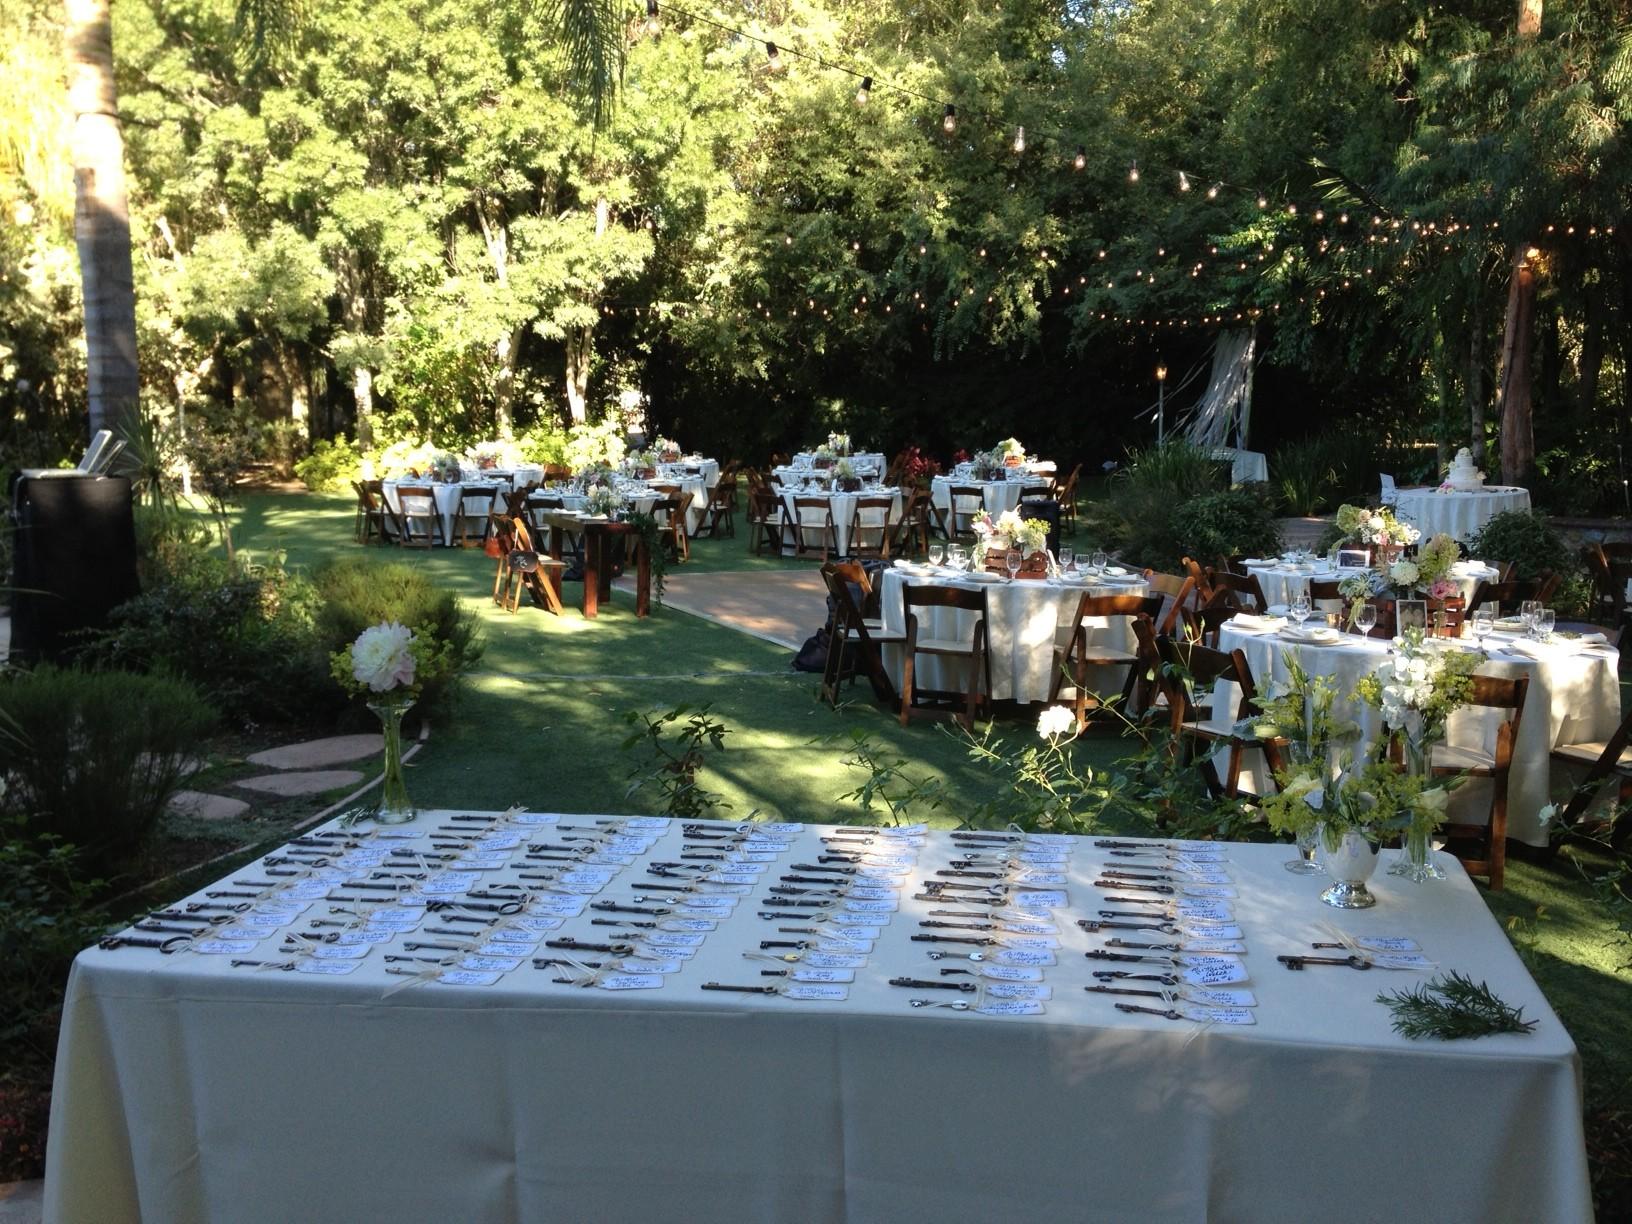 hartley botanica mc at a wedding dj los angeles elegant